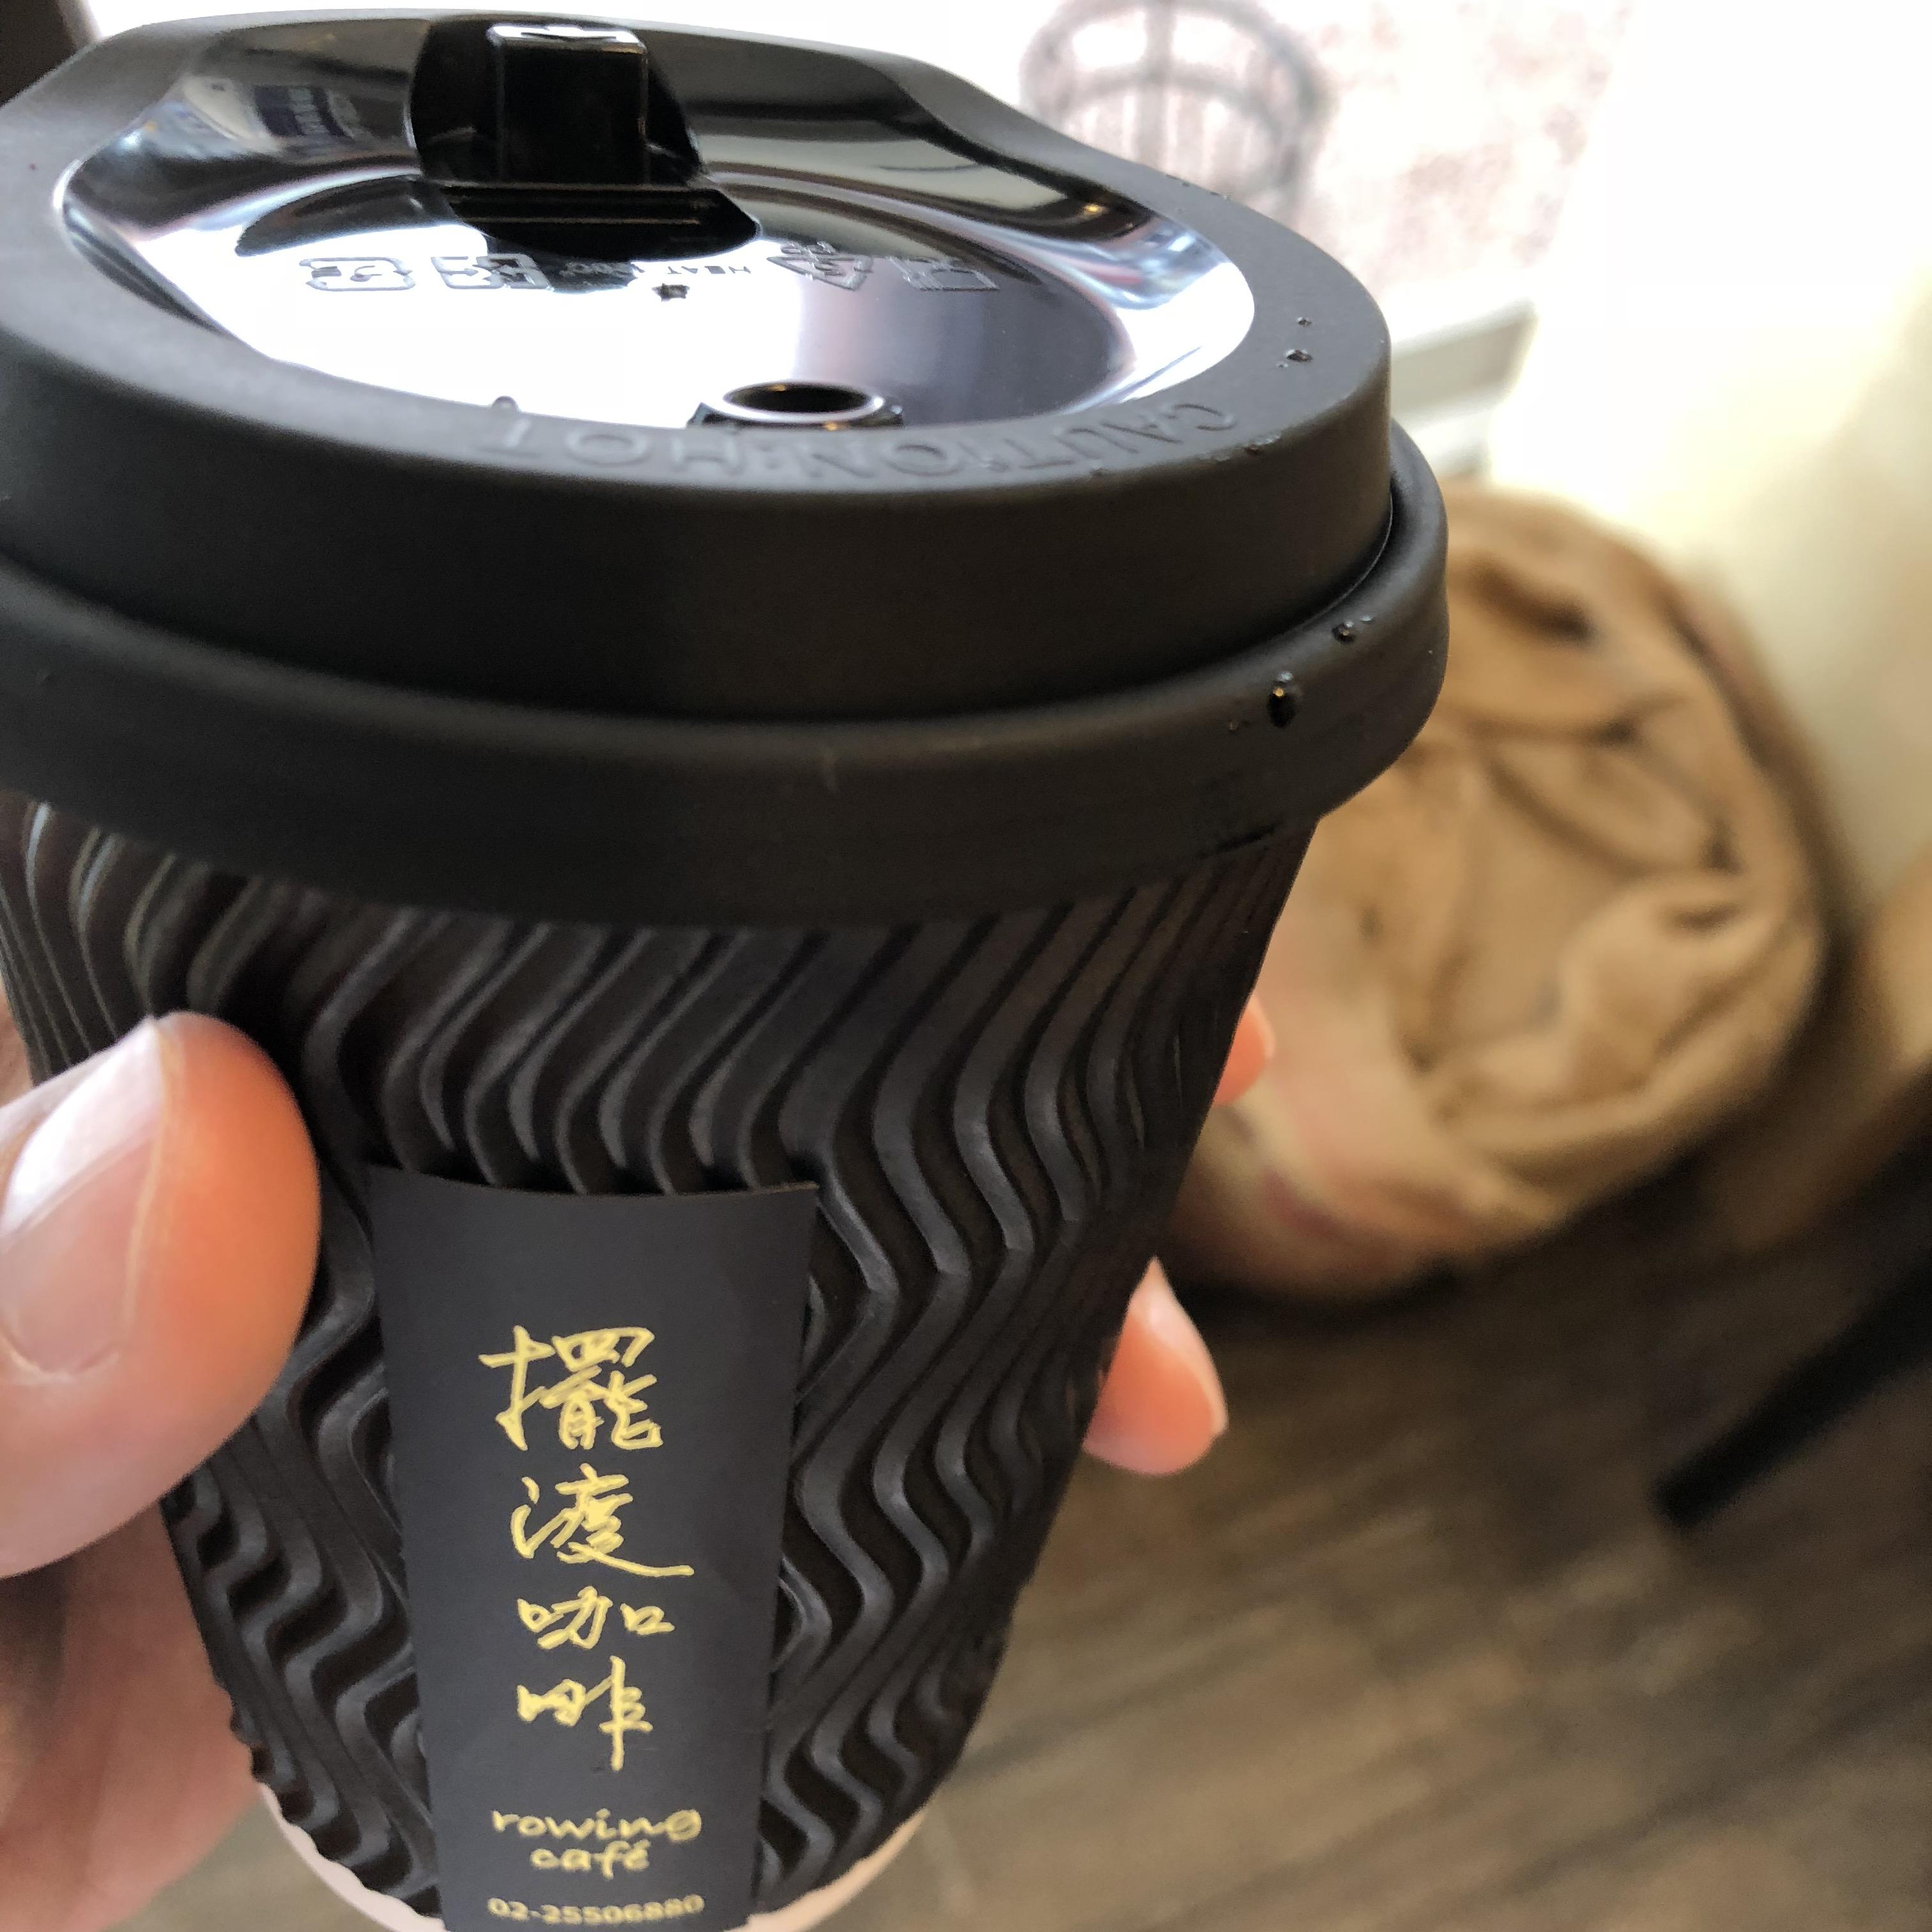 Baido Coffee | DaDaoCheng, TW